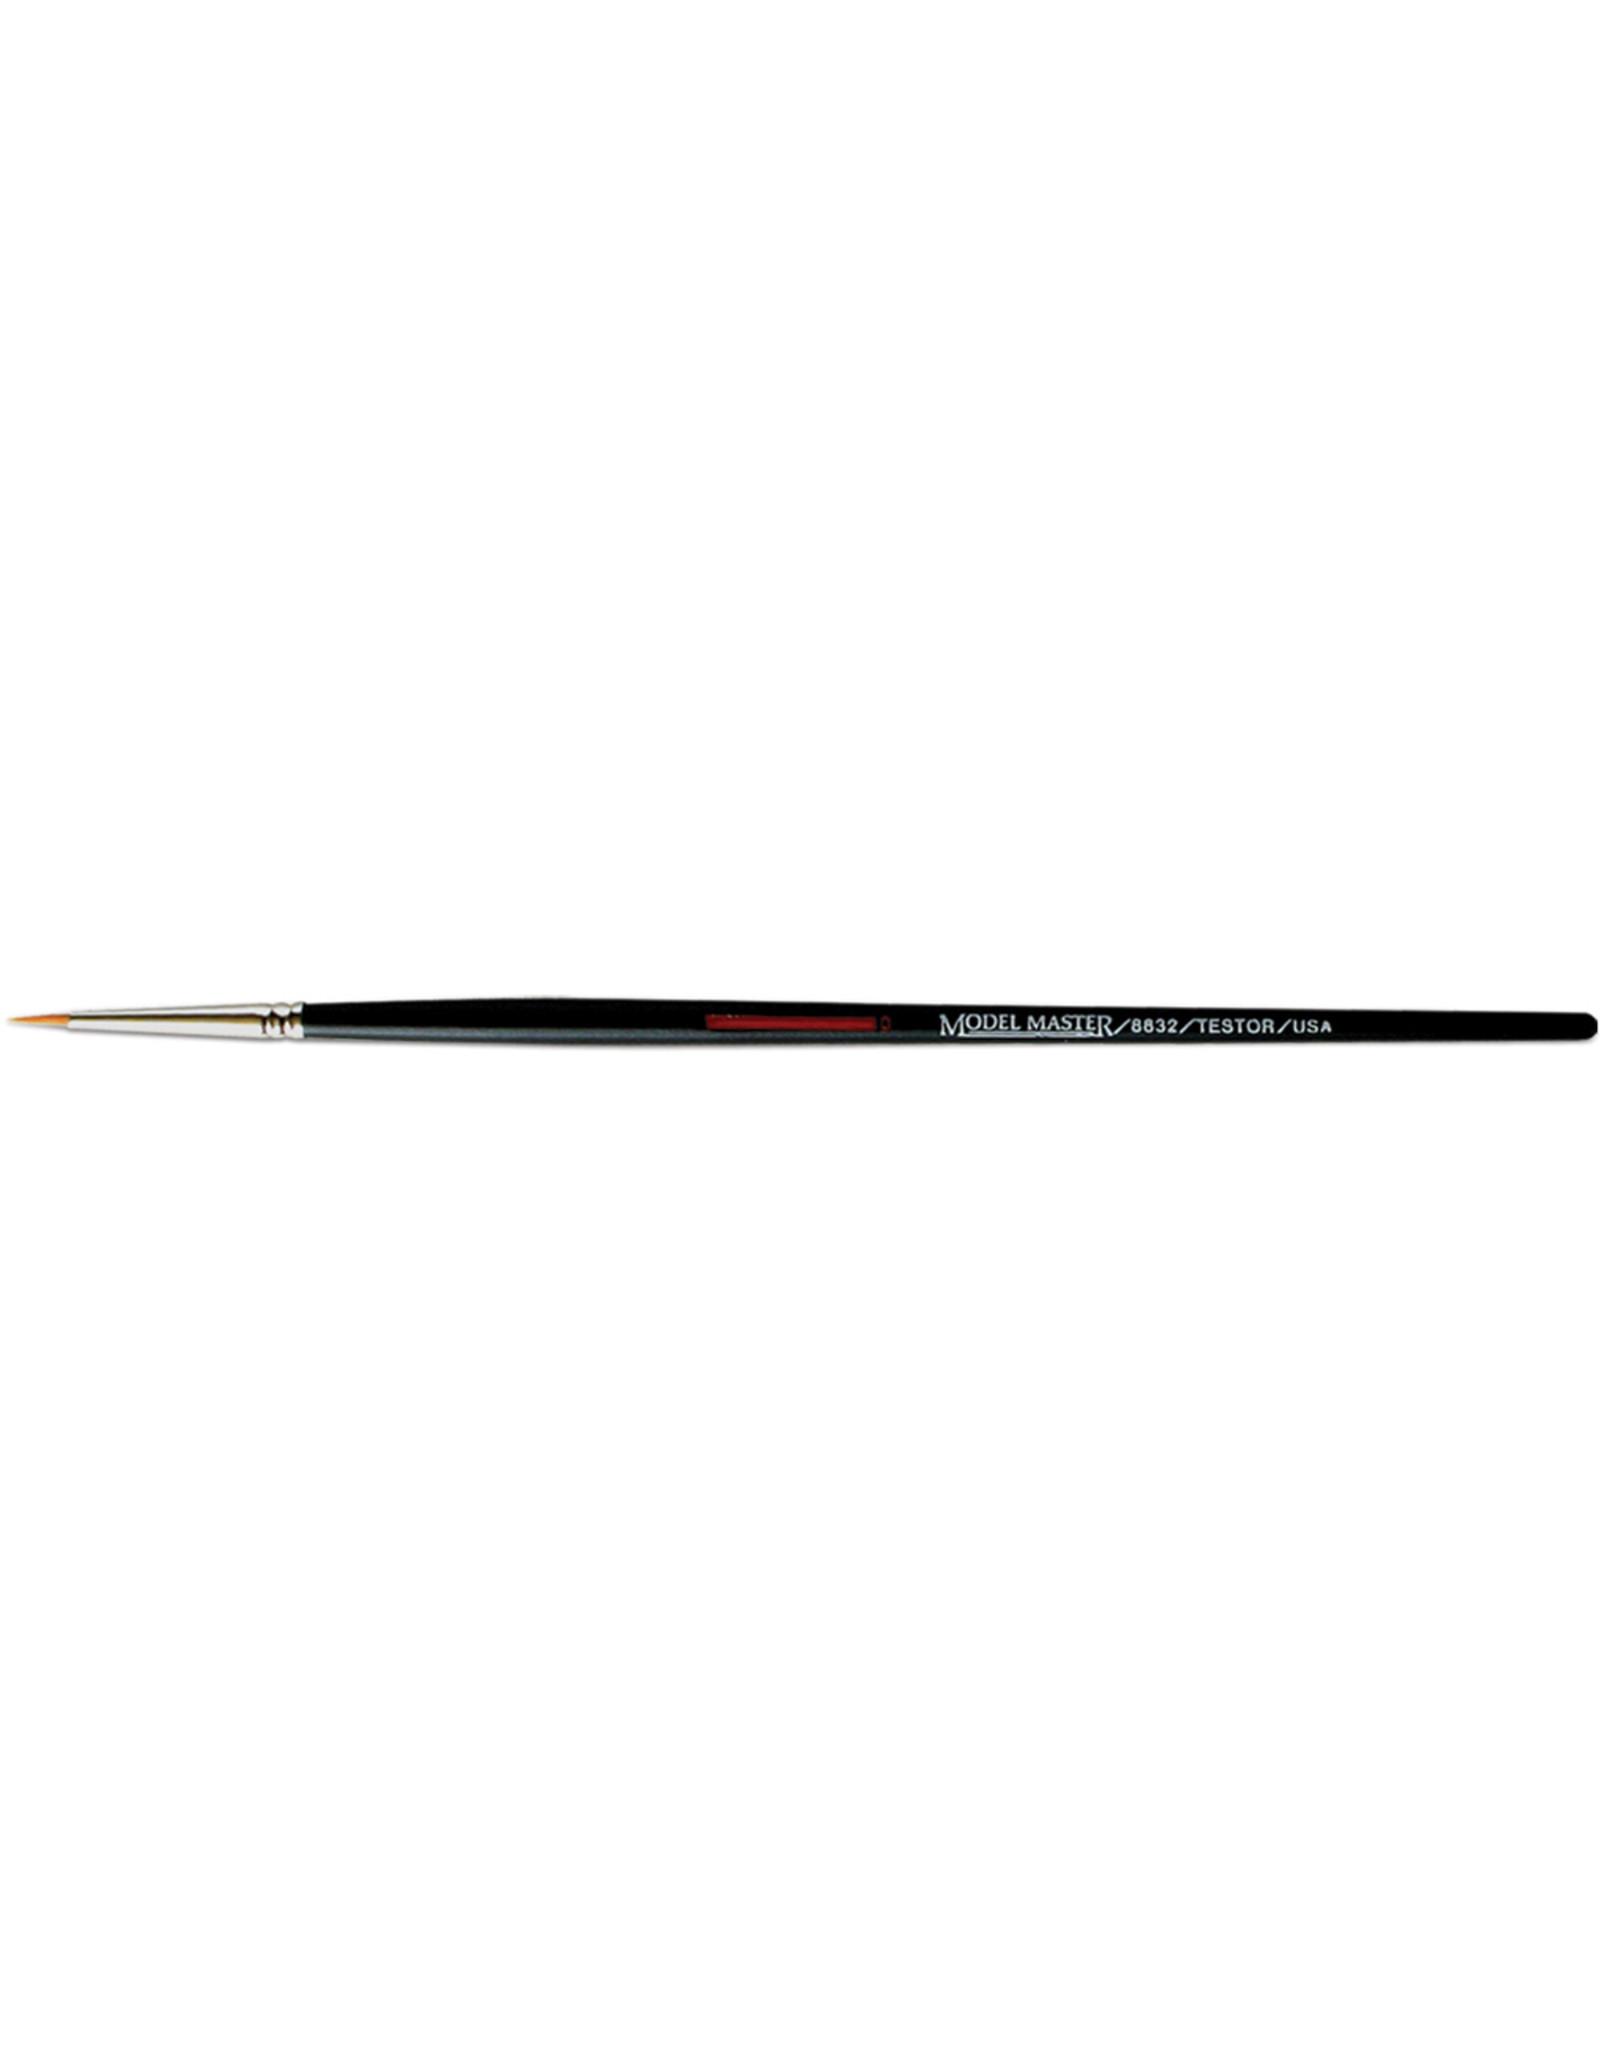 Testors 8832C - Golden Synthetic Round Brush #0